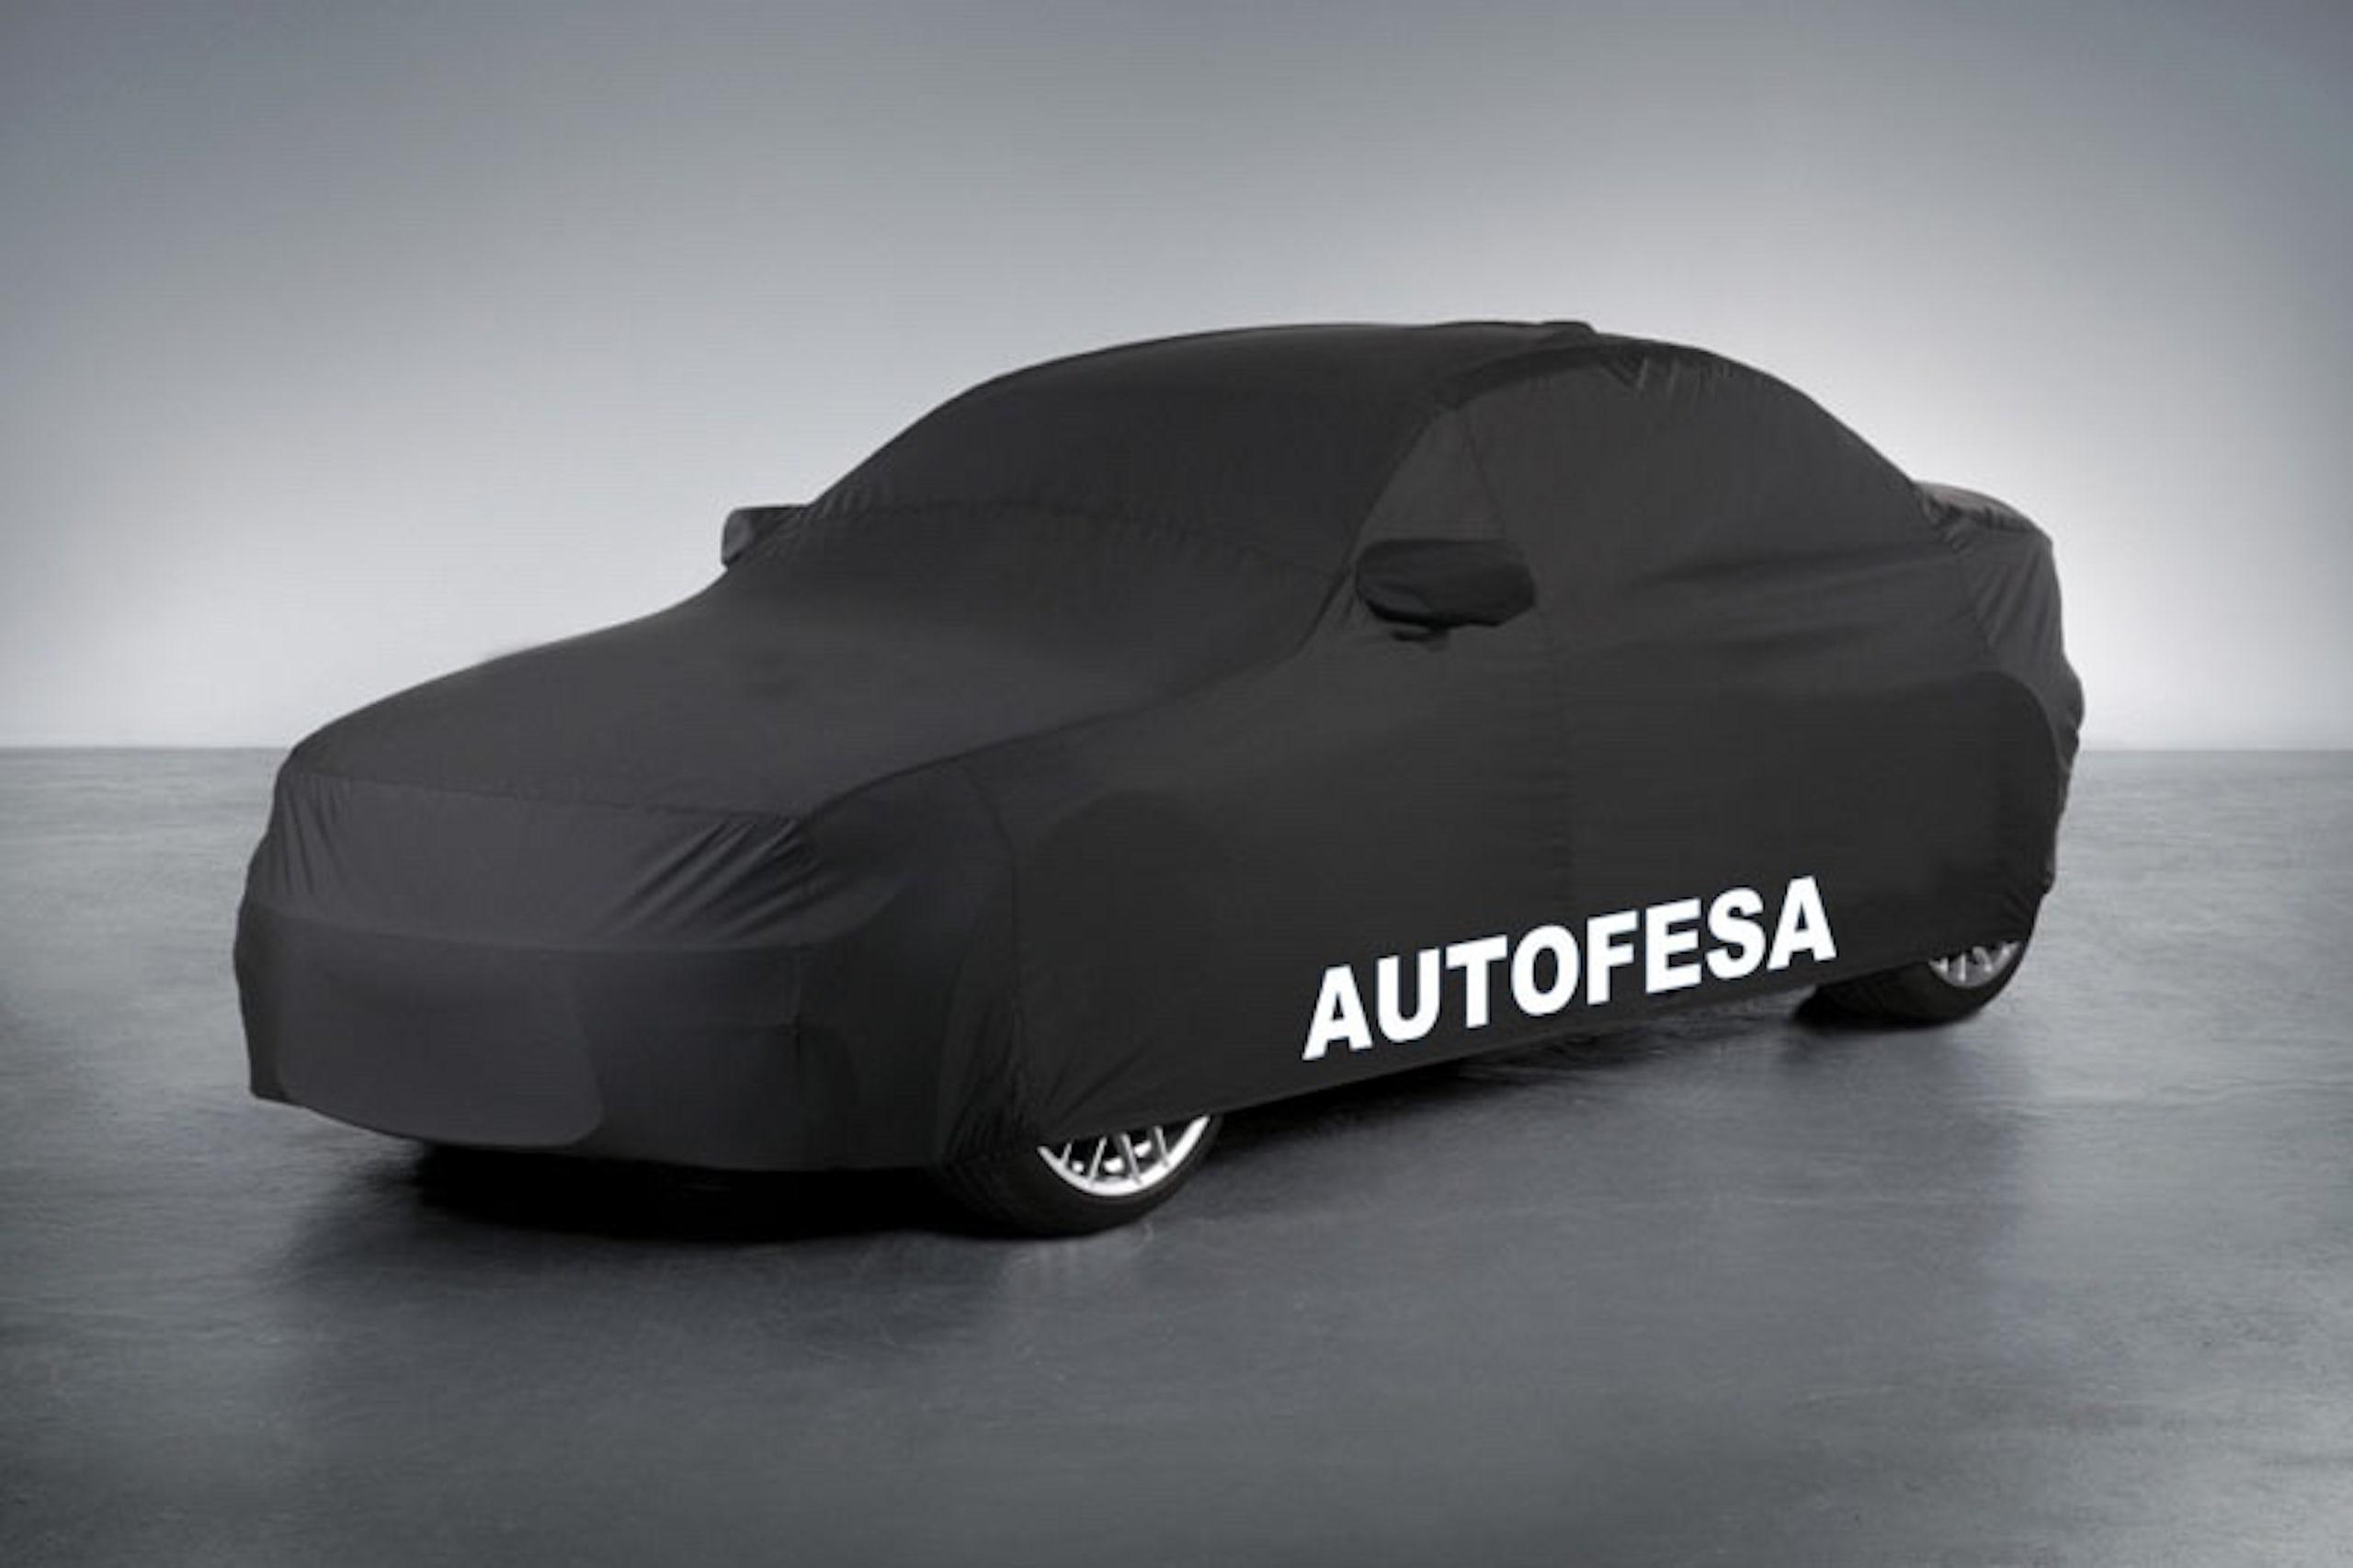 Volvo Xc 60 2.0 T8 Twin Momentum Hybrido Enchufable AWD Auto 407cv 5p S/S - Foto 20